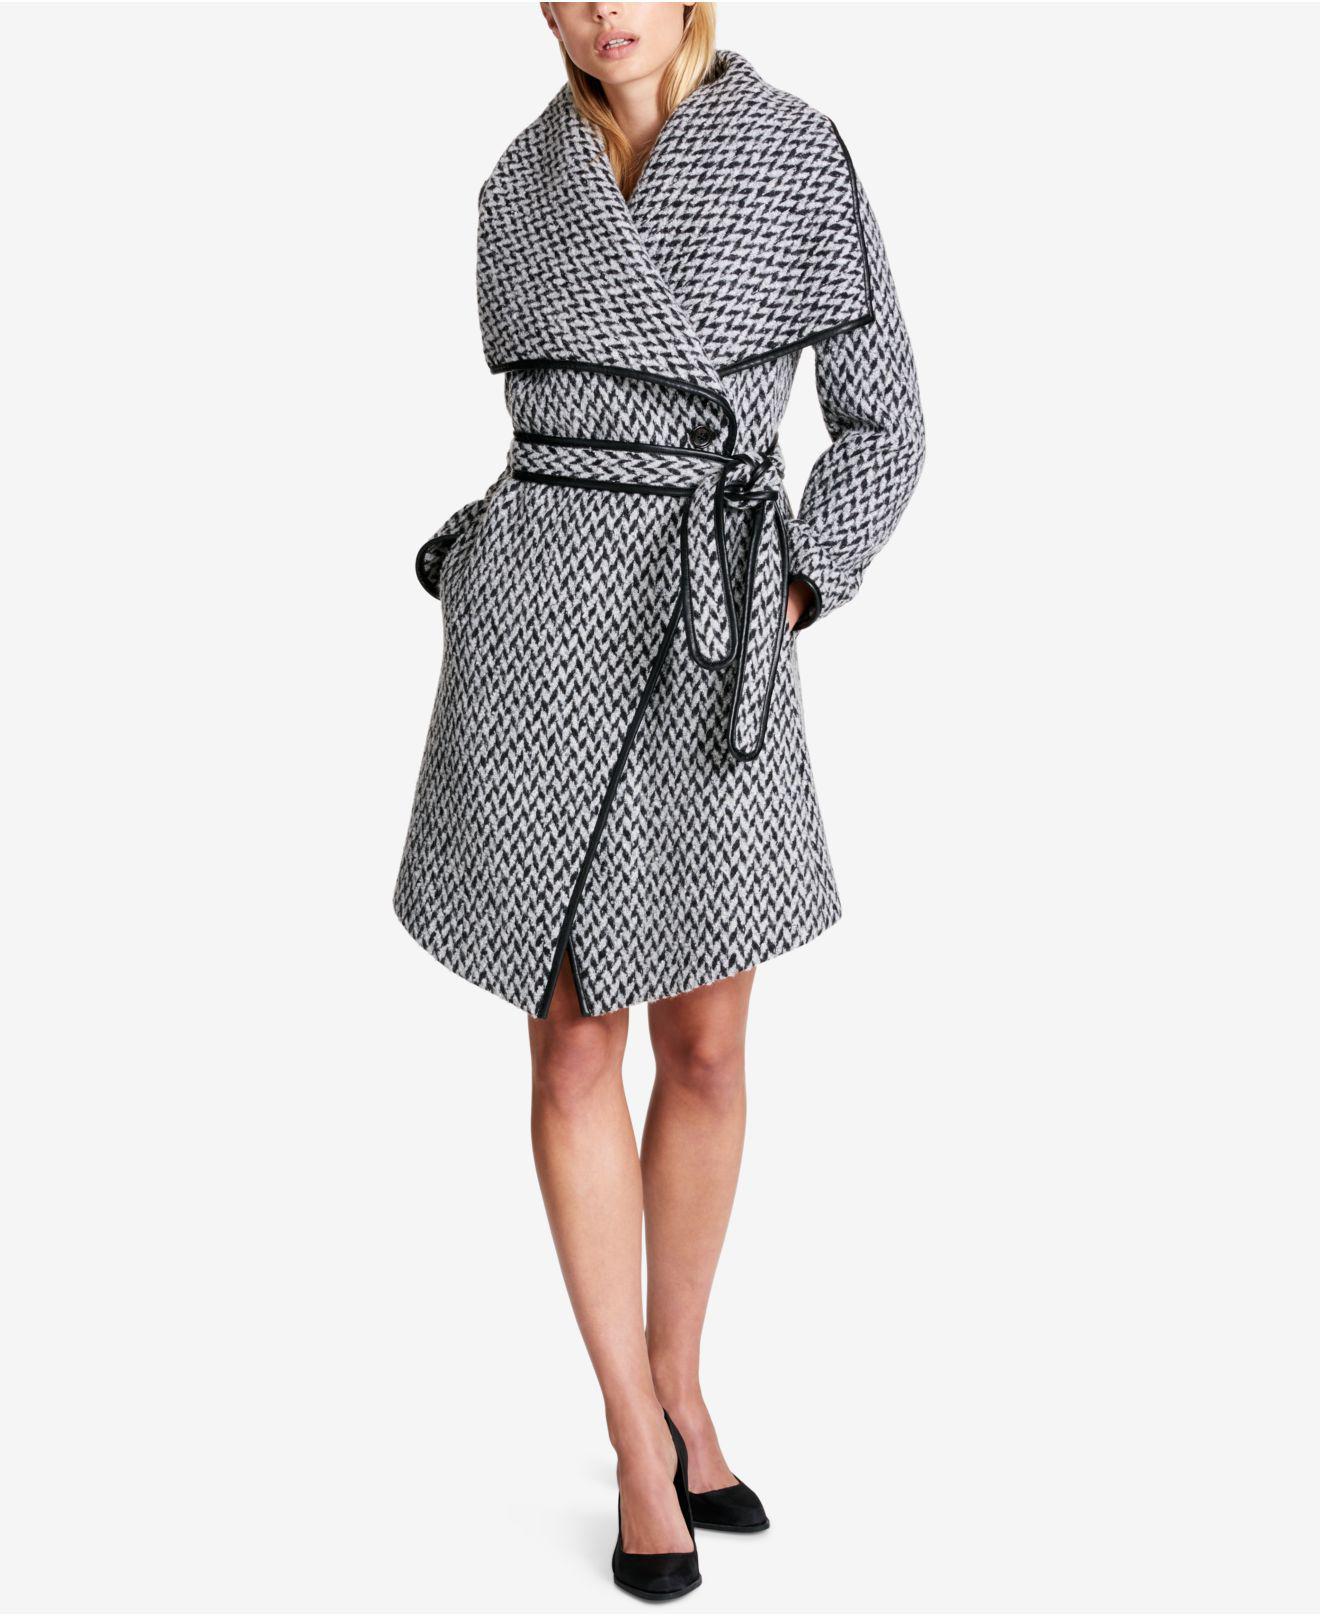 980b4eda8e554 Lyst - DKNY Faux-leather-trim Textured Wrap Coat